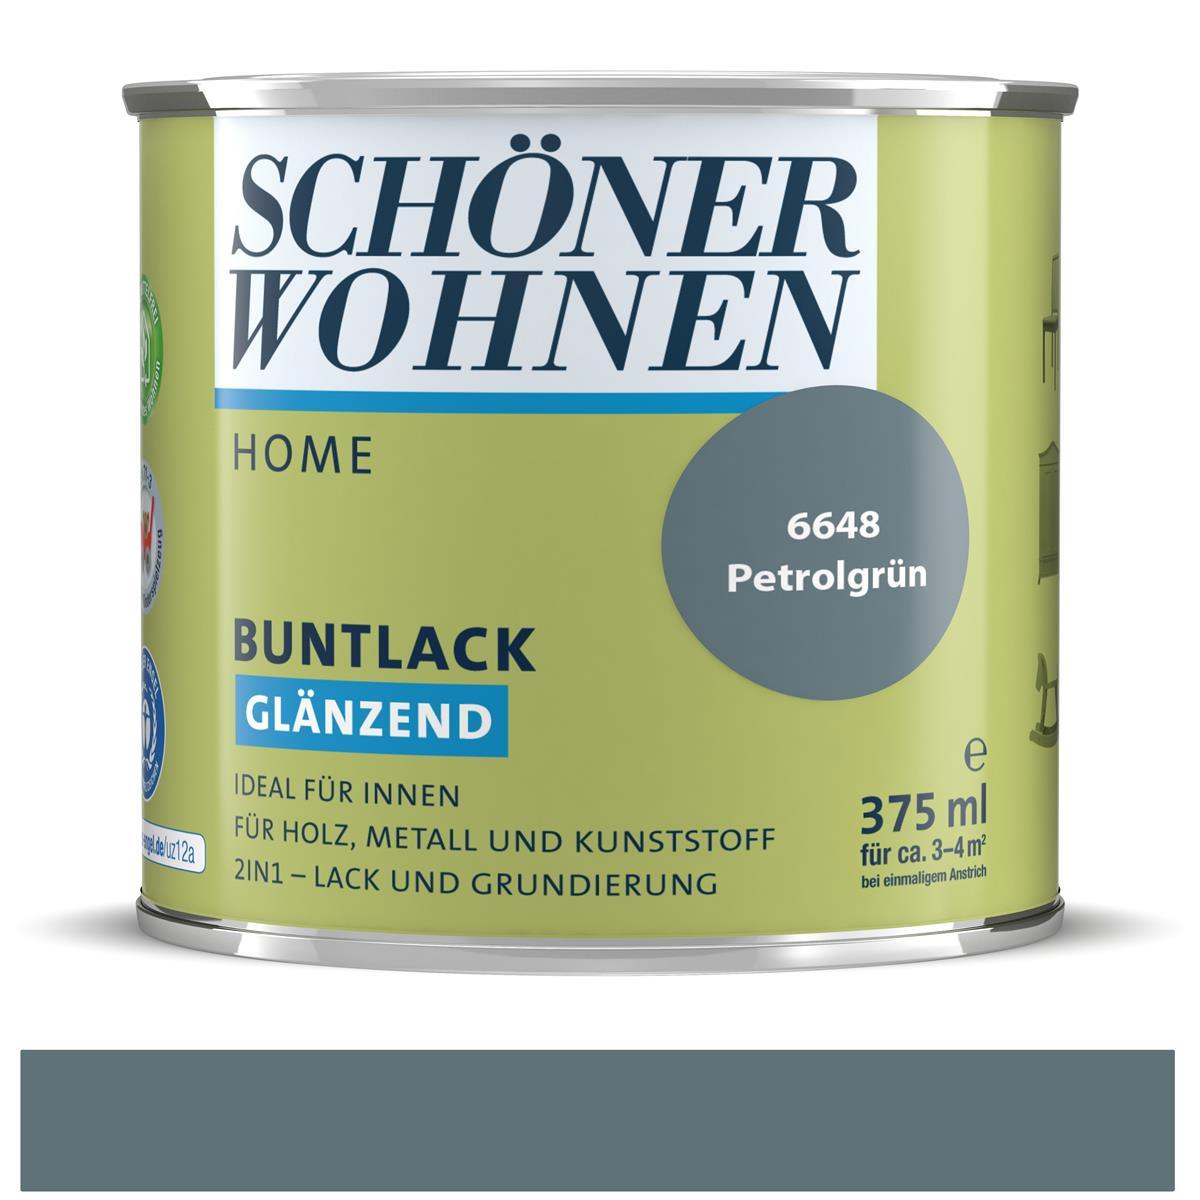 Schoner Wohnen Home Buntlack Petrolgrun Glanzend 375 Ml